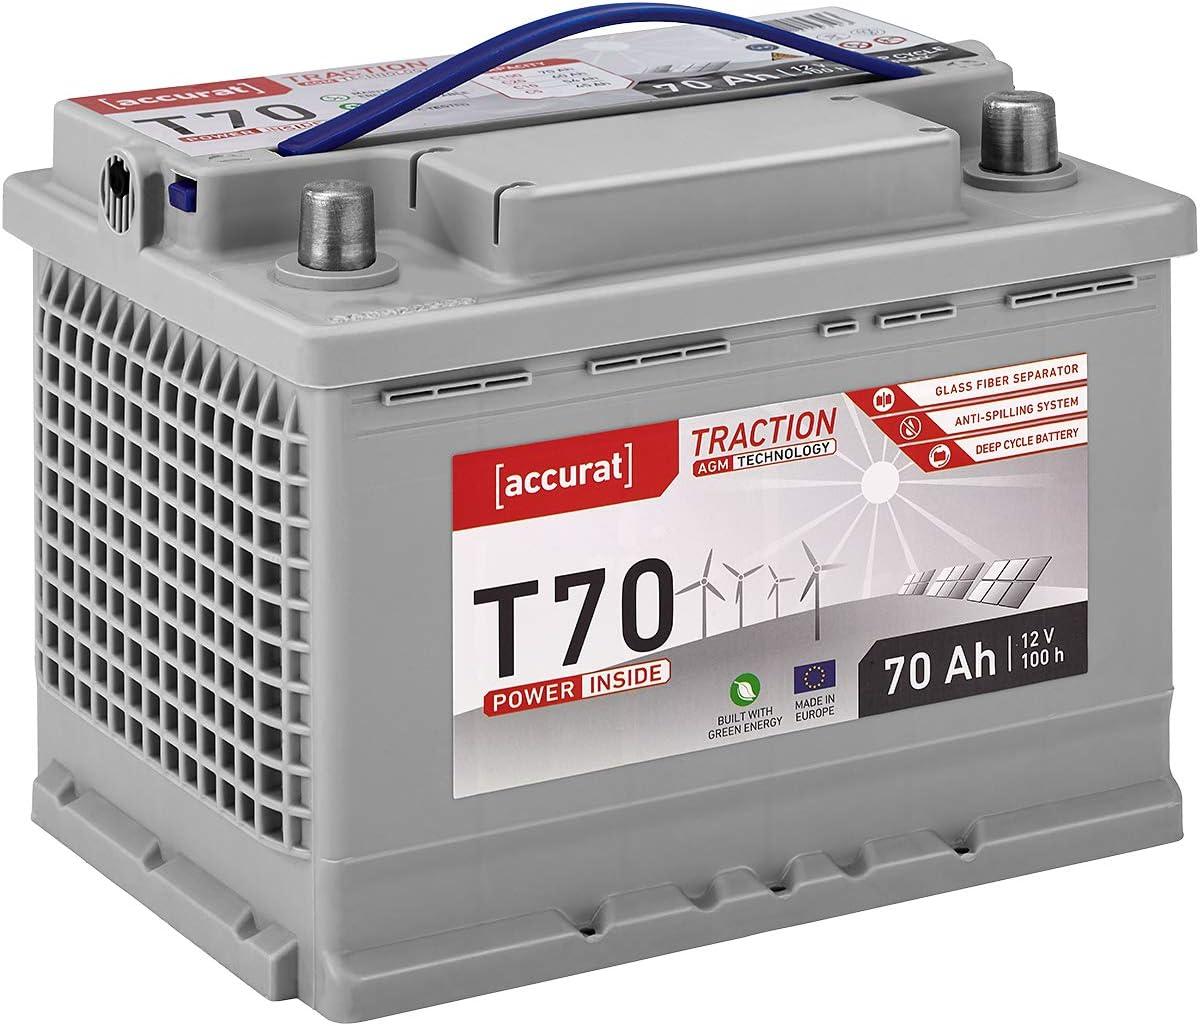 Accurat 12v 70ah Agm Batterie Vrla Zyklenfeste Versorgungsbatterie In 6 Varianten Auto